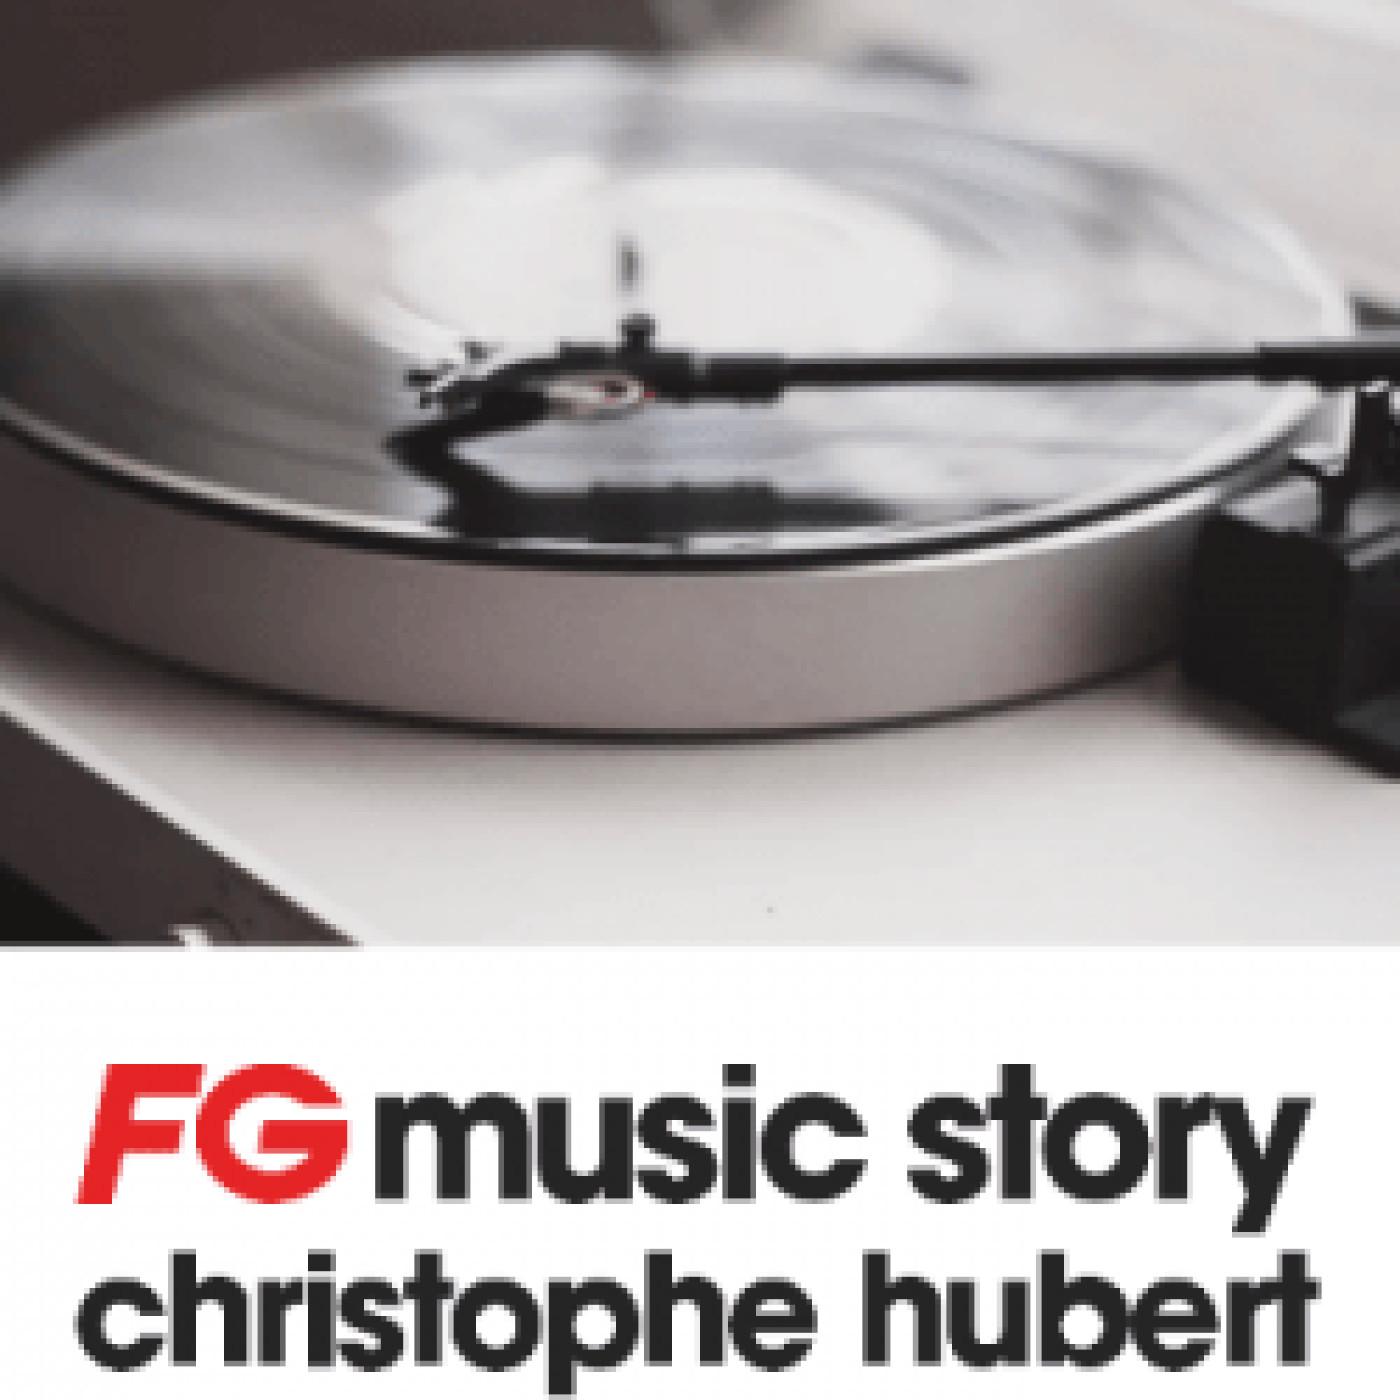 FG MUSIC STORY : DAVID GUETTA & MORTEN